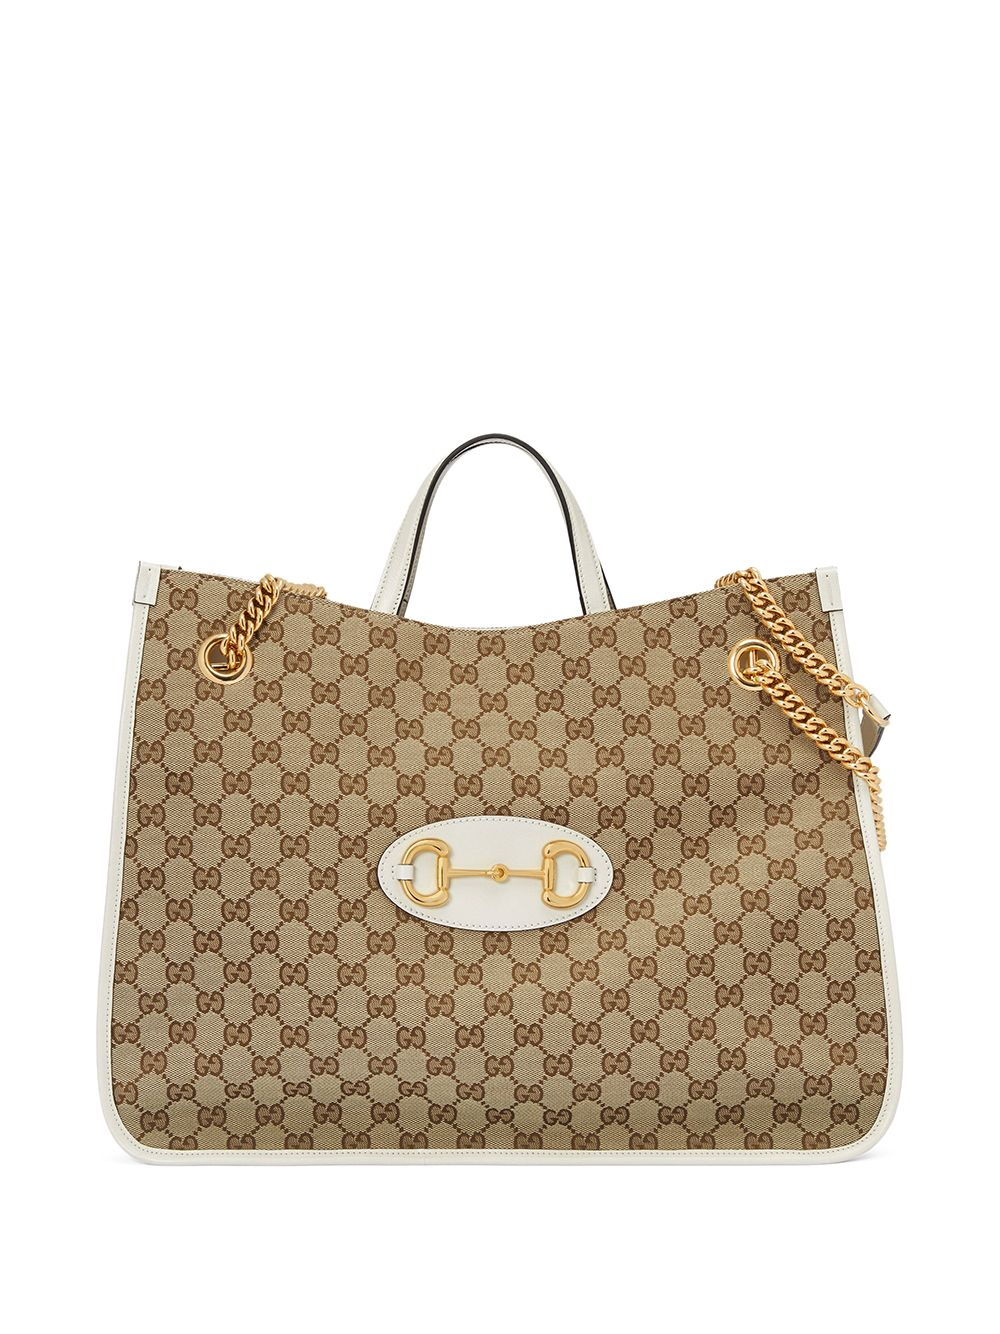 Horsebit Shopping Bag